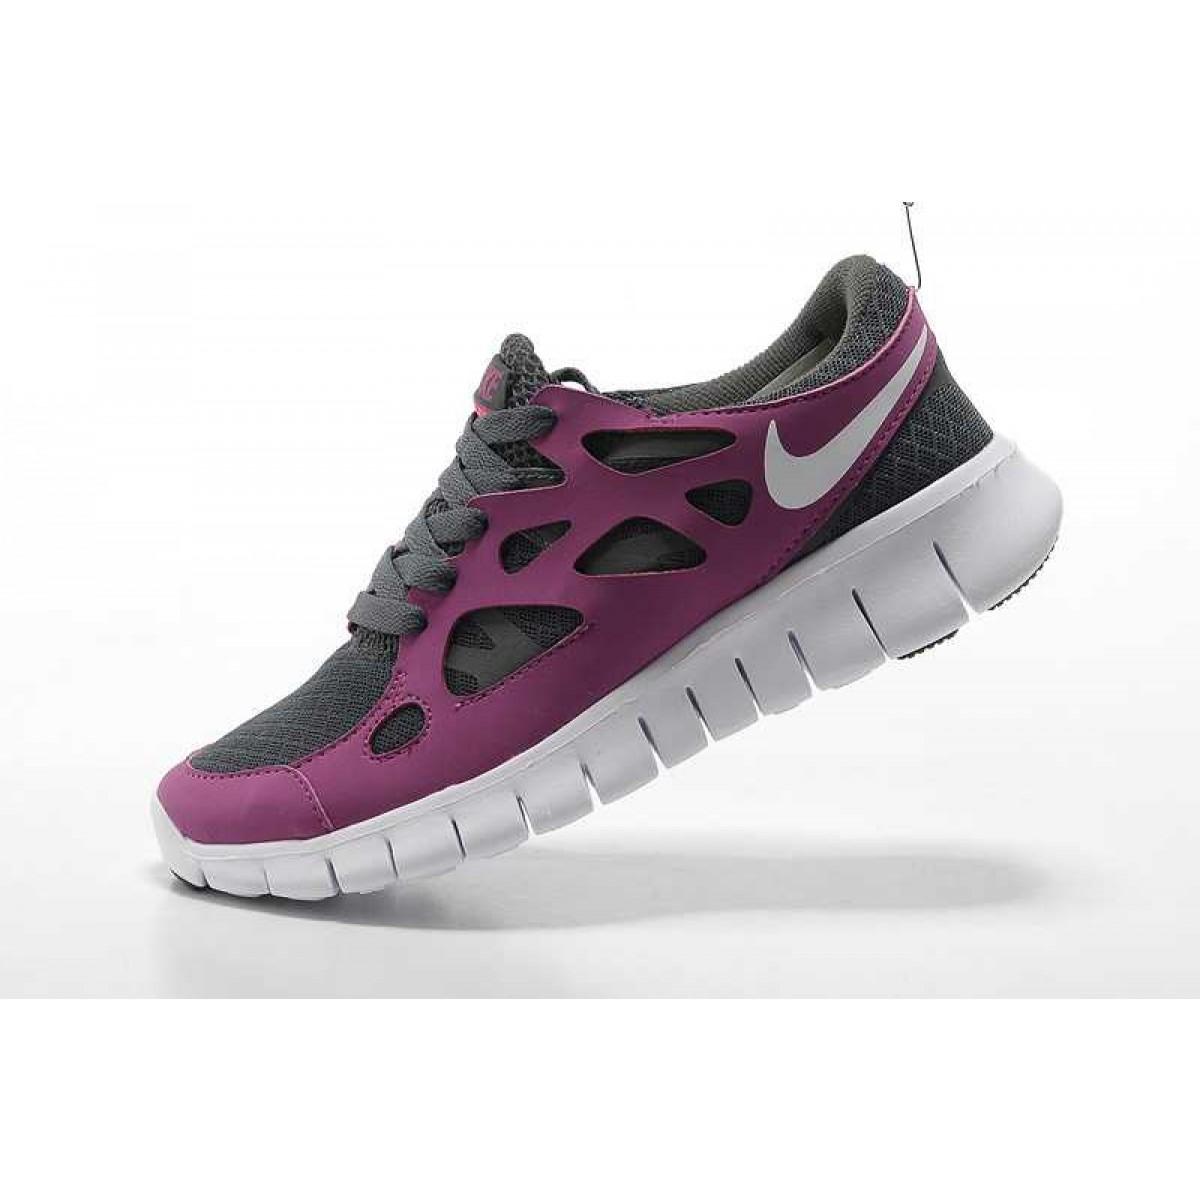 on sale bbe99 8435f Nike Free Run 2 Femme Chaussures Blanc Pourpre,nike free run 3,fashioniable,